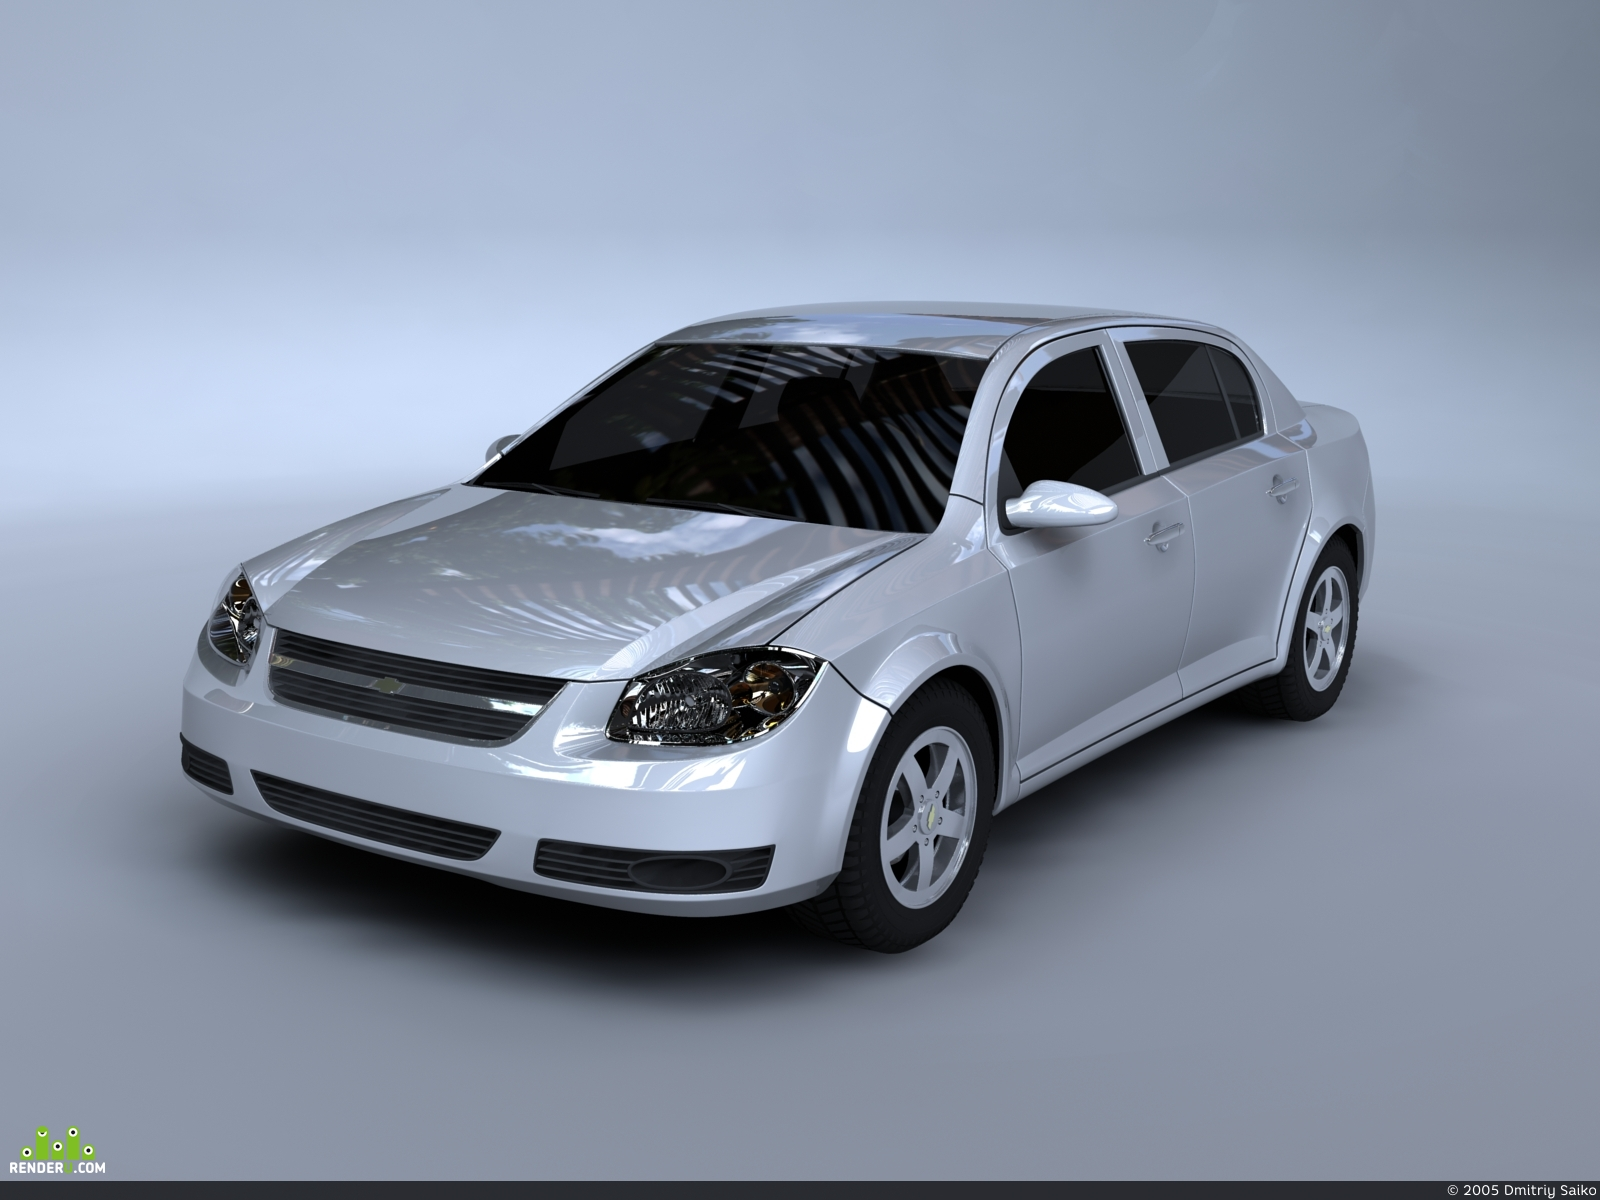 preview Chevrolet Cobalt